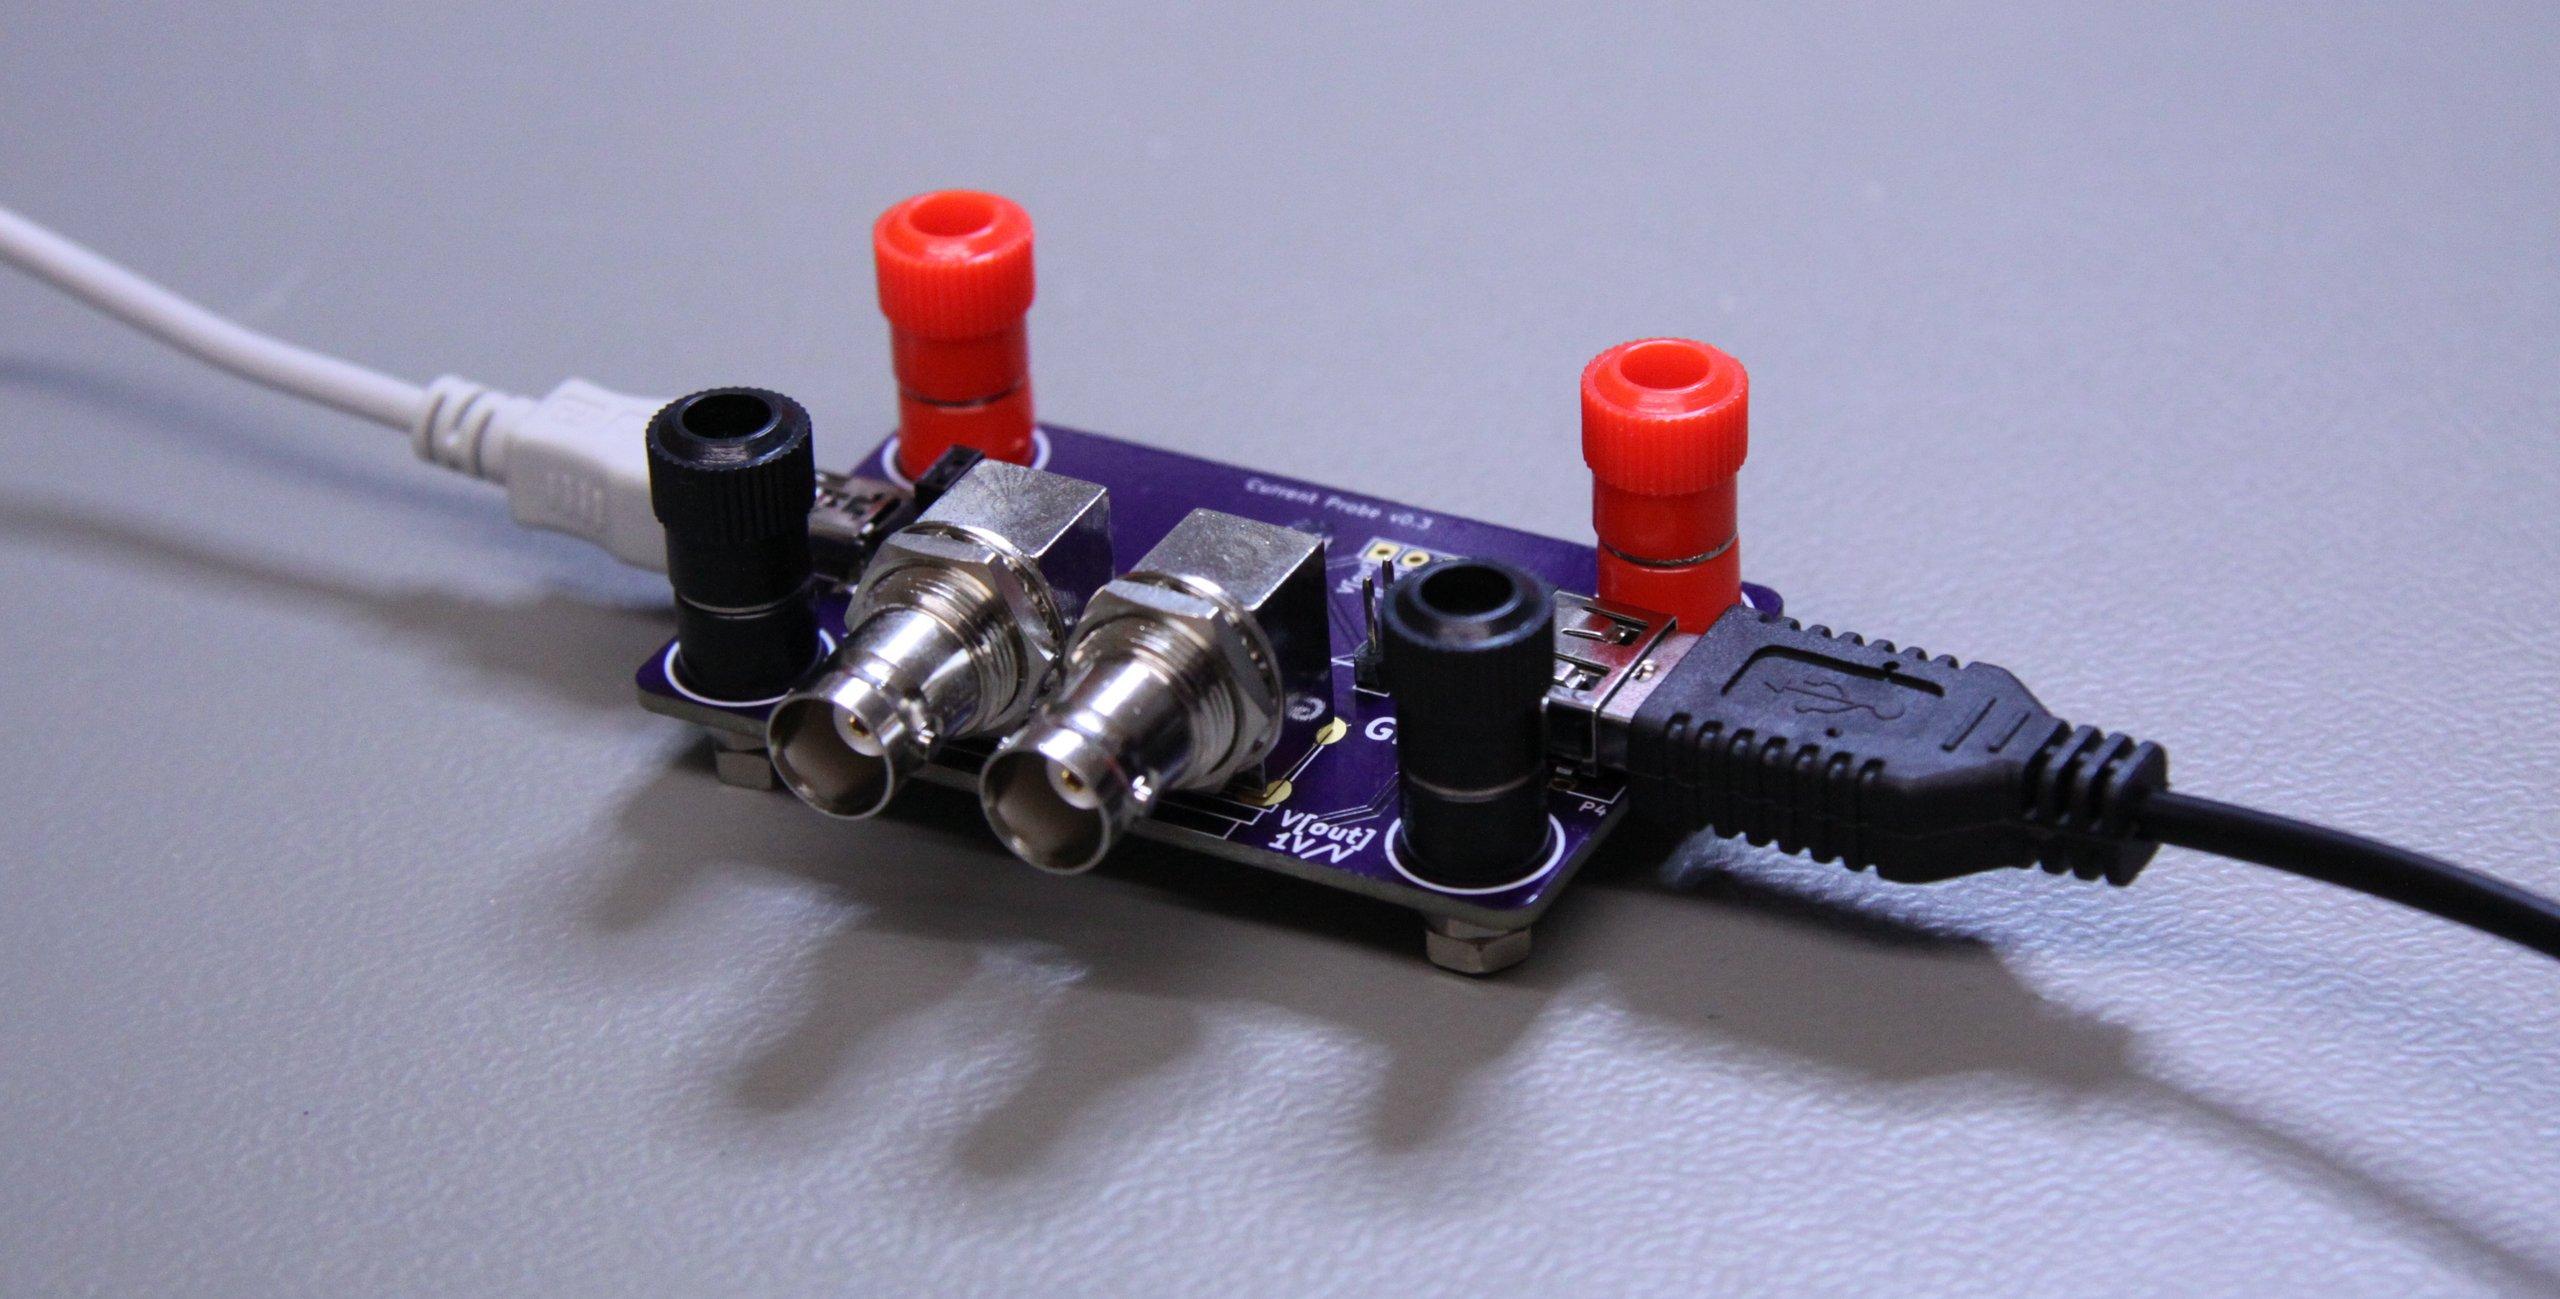 Oscilloscope Current Probe : Oscilloscope current probe adapter from leonerd on tindie